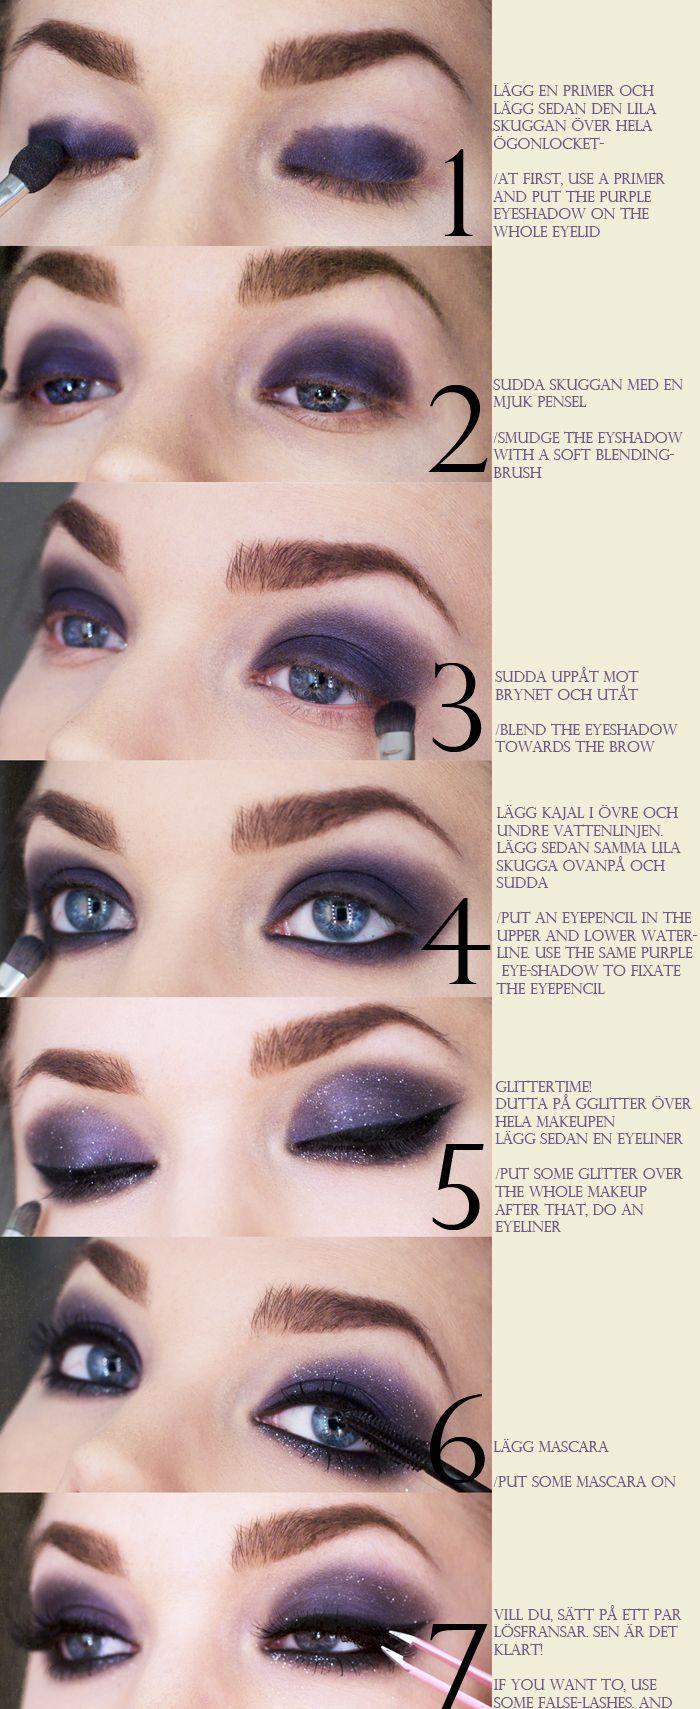 host a motives party | face | pinterest | makeup, eye makeup and